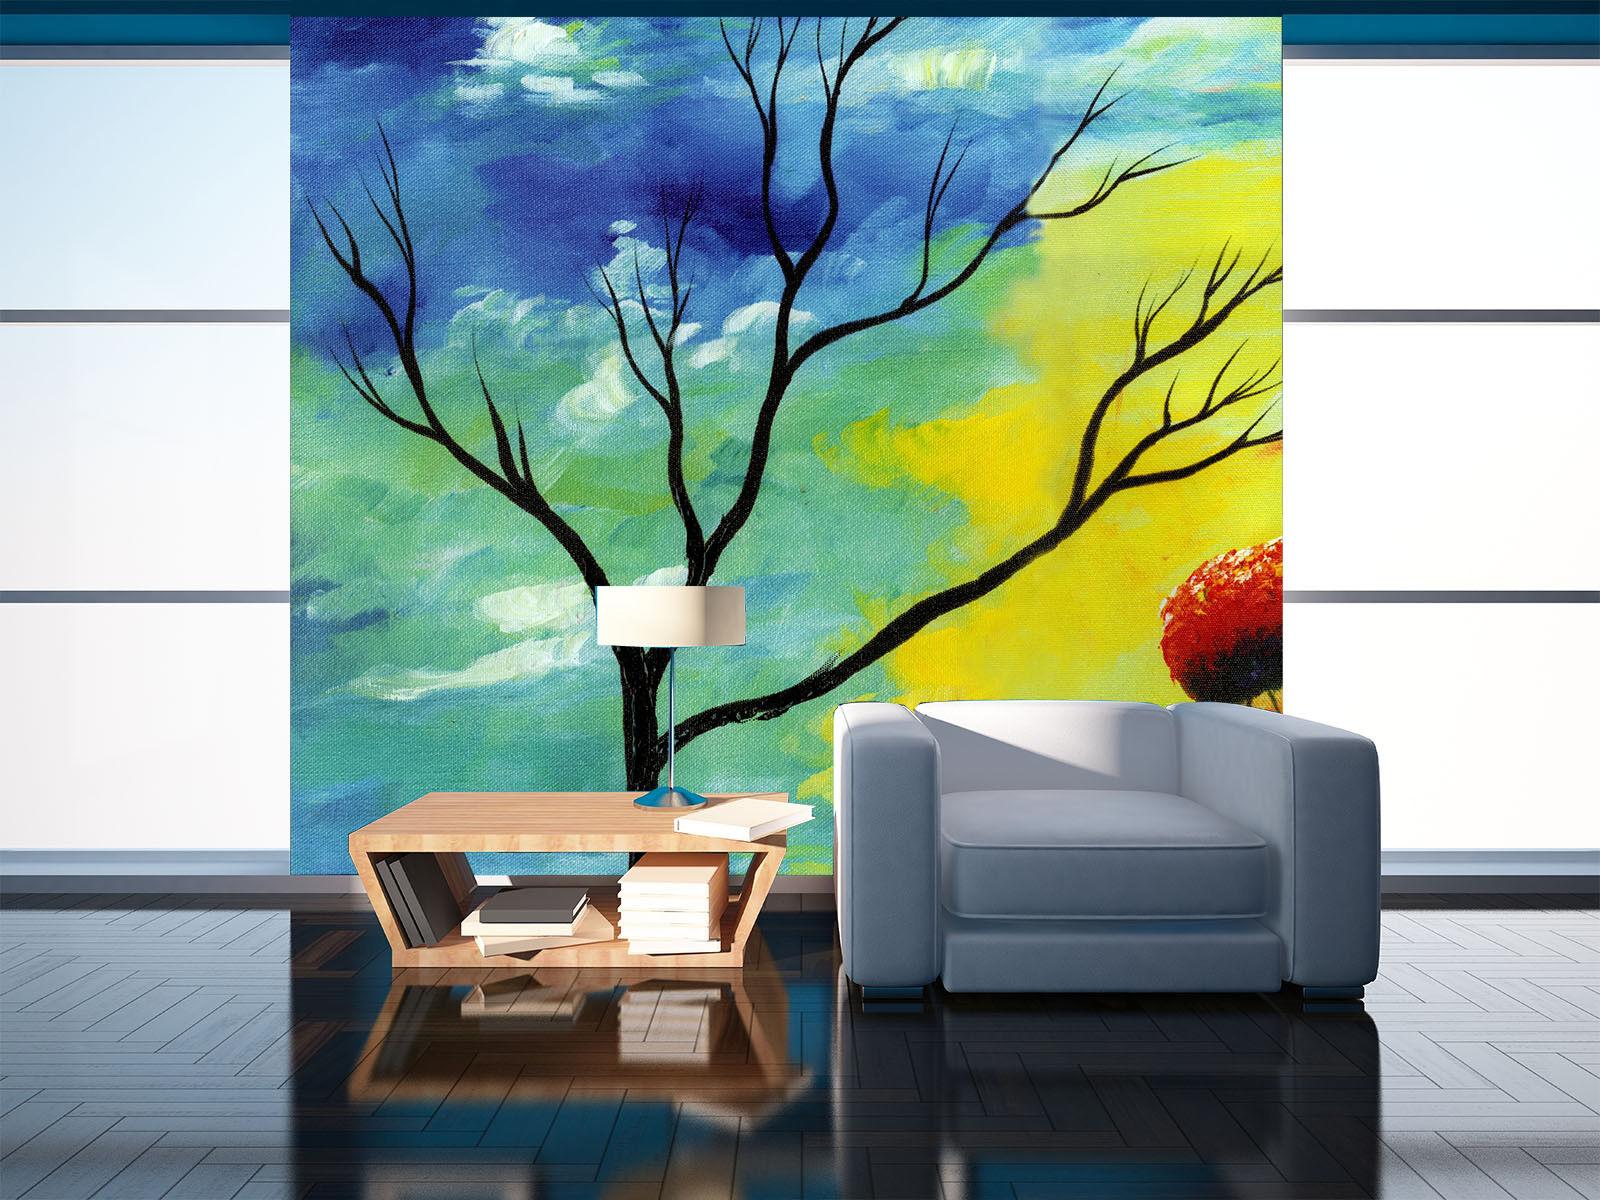 3D Branches 4247 Wallpaper Murals Wall Print Wall Mural AJ WALLPAPER UK Lemon